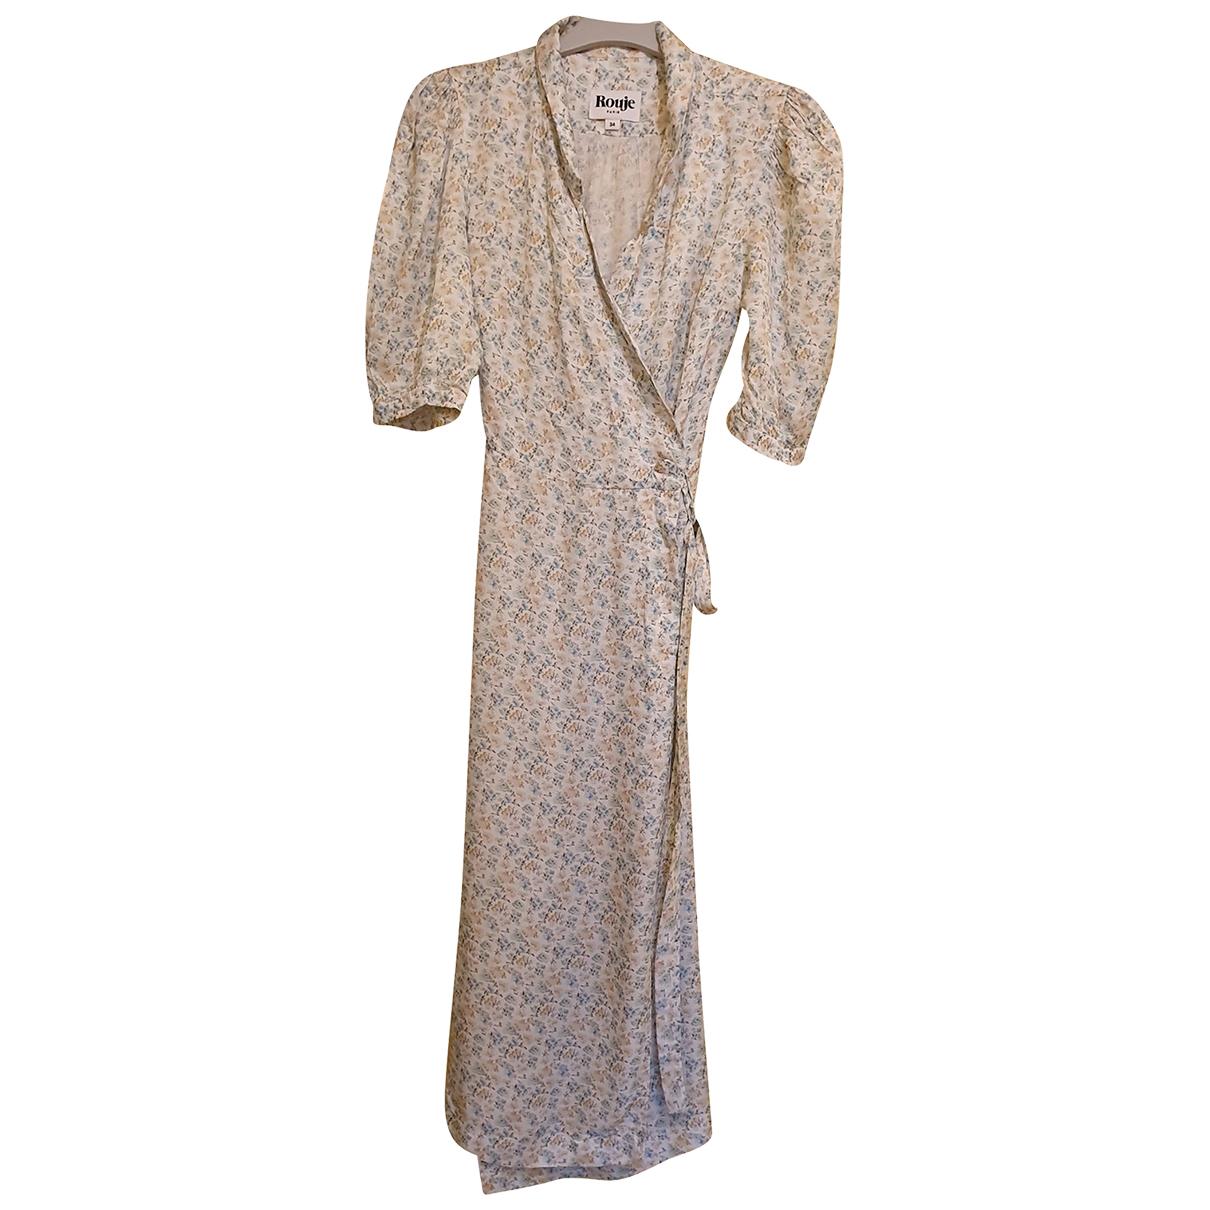 Rouje N Multicolour dress for Women 34 FR